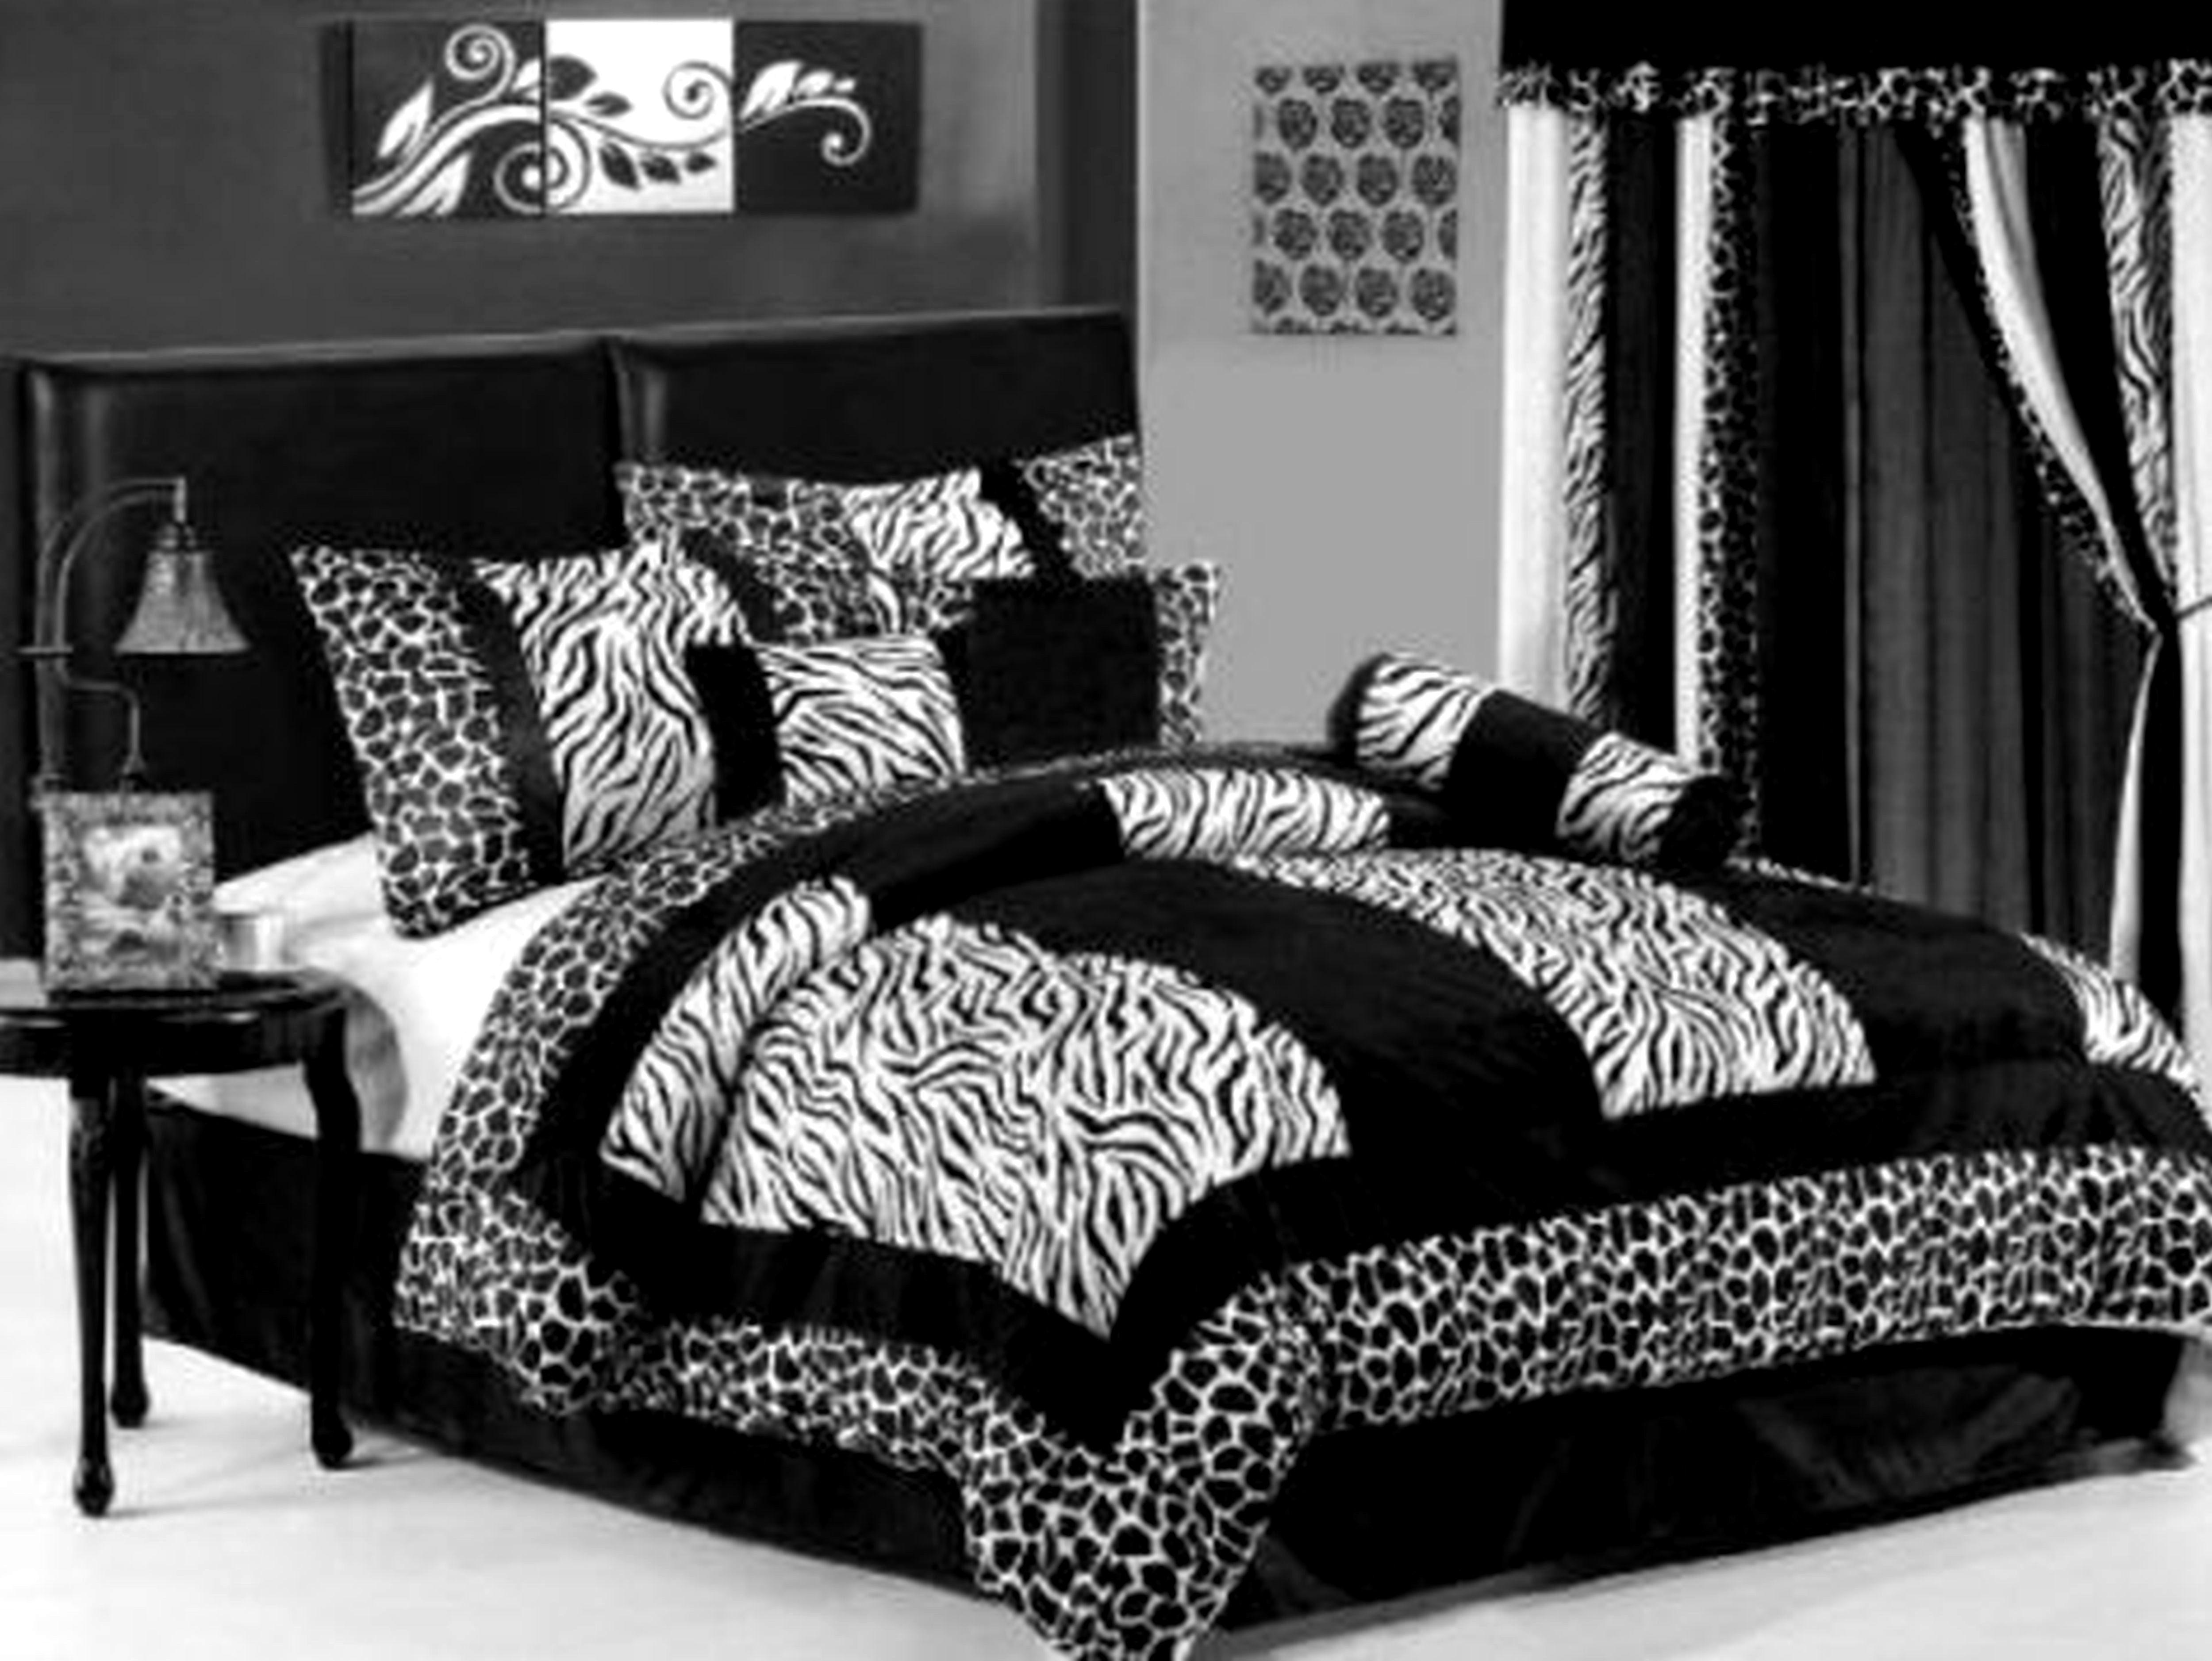 Red And Black Zebra Print Bedroom Ideas